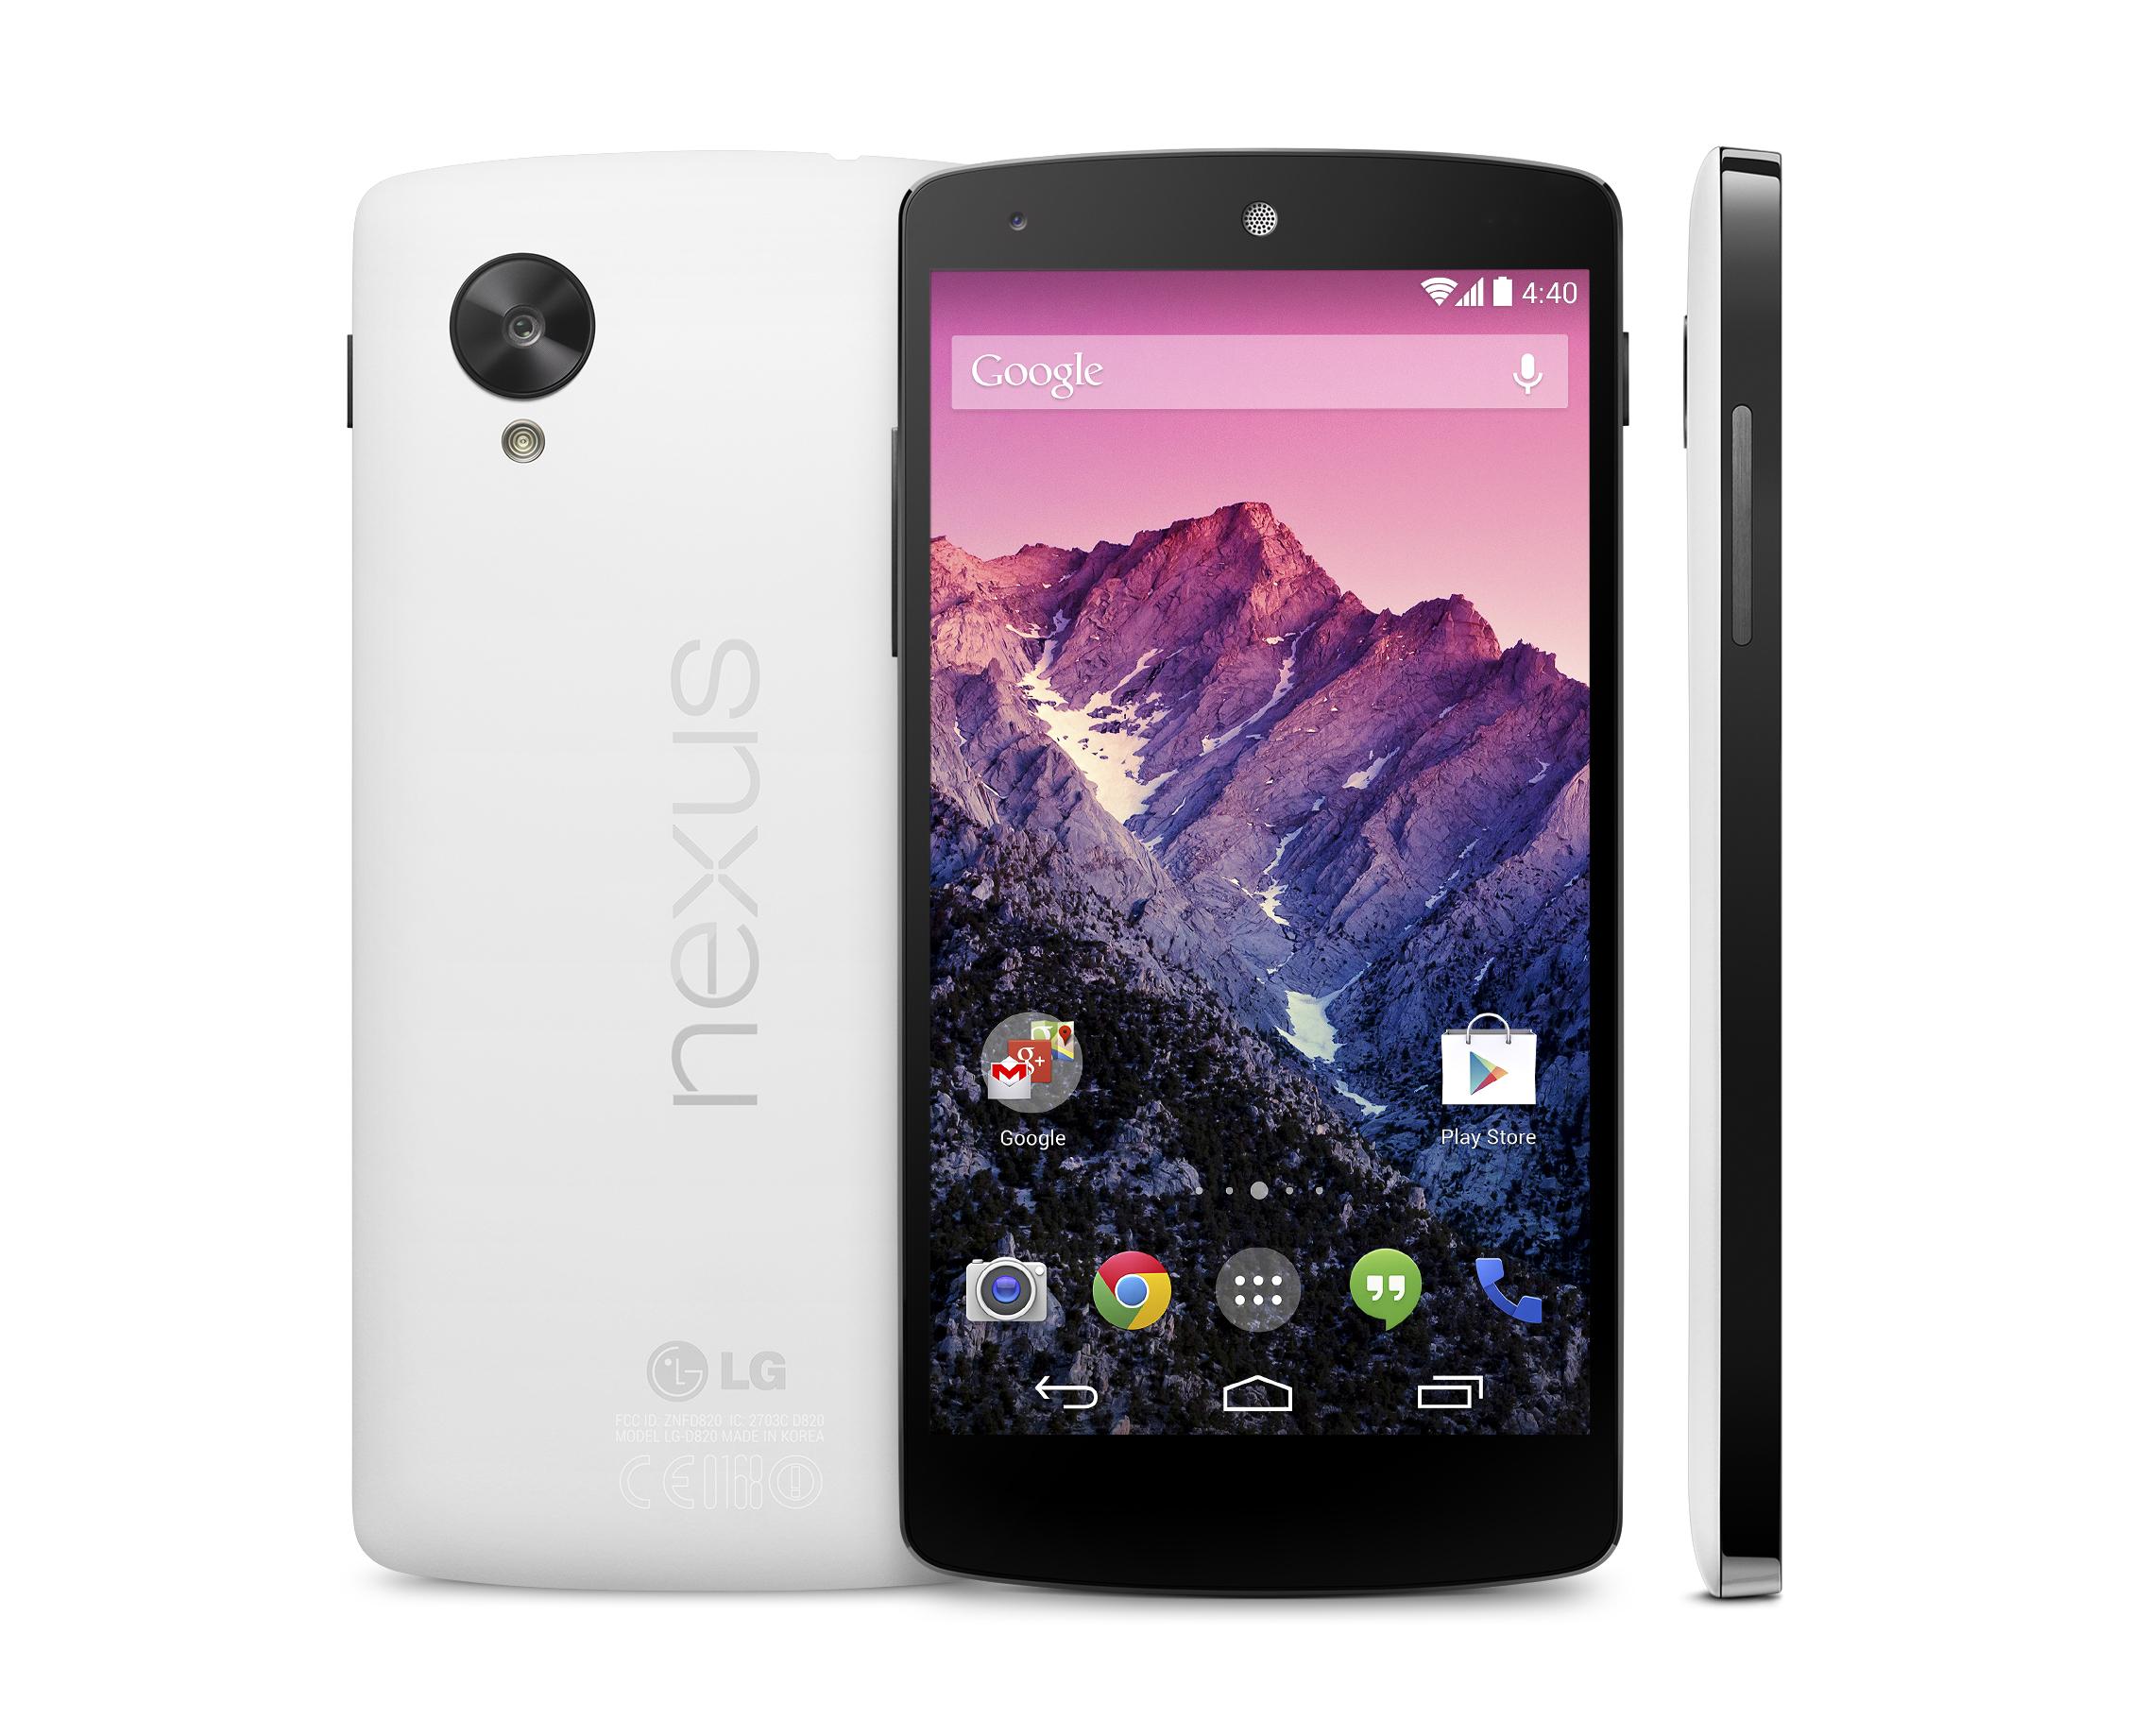 Google's New Nexus 5 Is the Googley-est Phone Yet